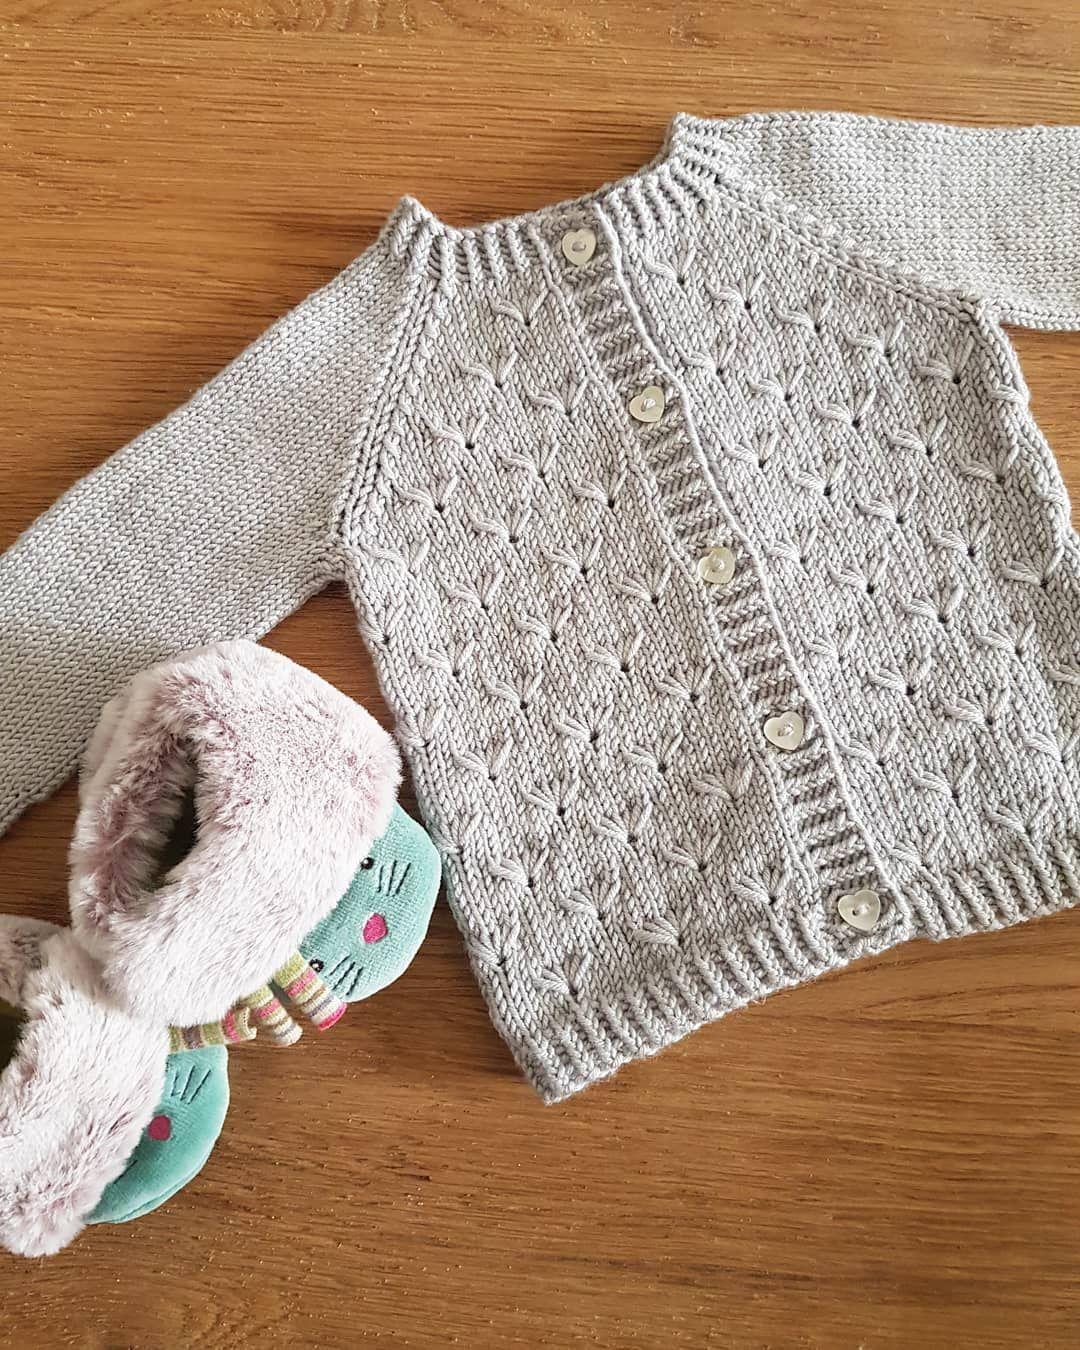 52 Free Beautiful Baby Knitting Amp Crochet Patterns For